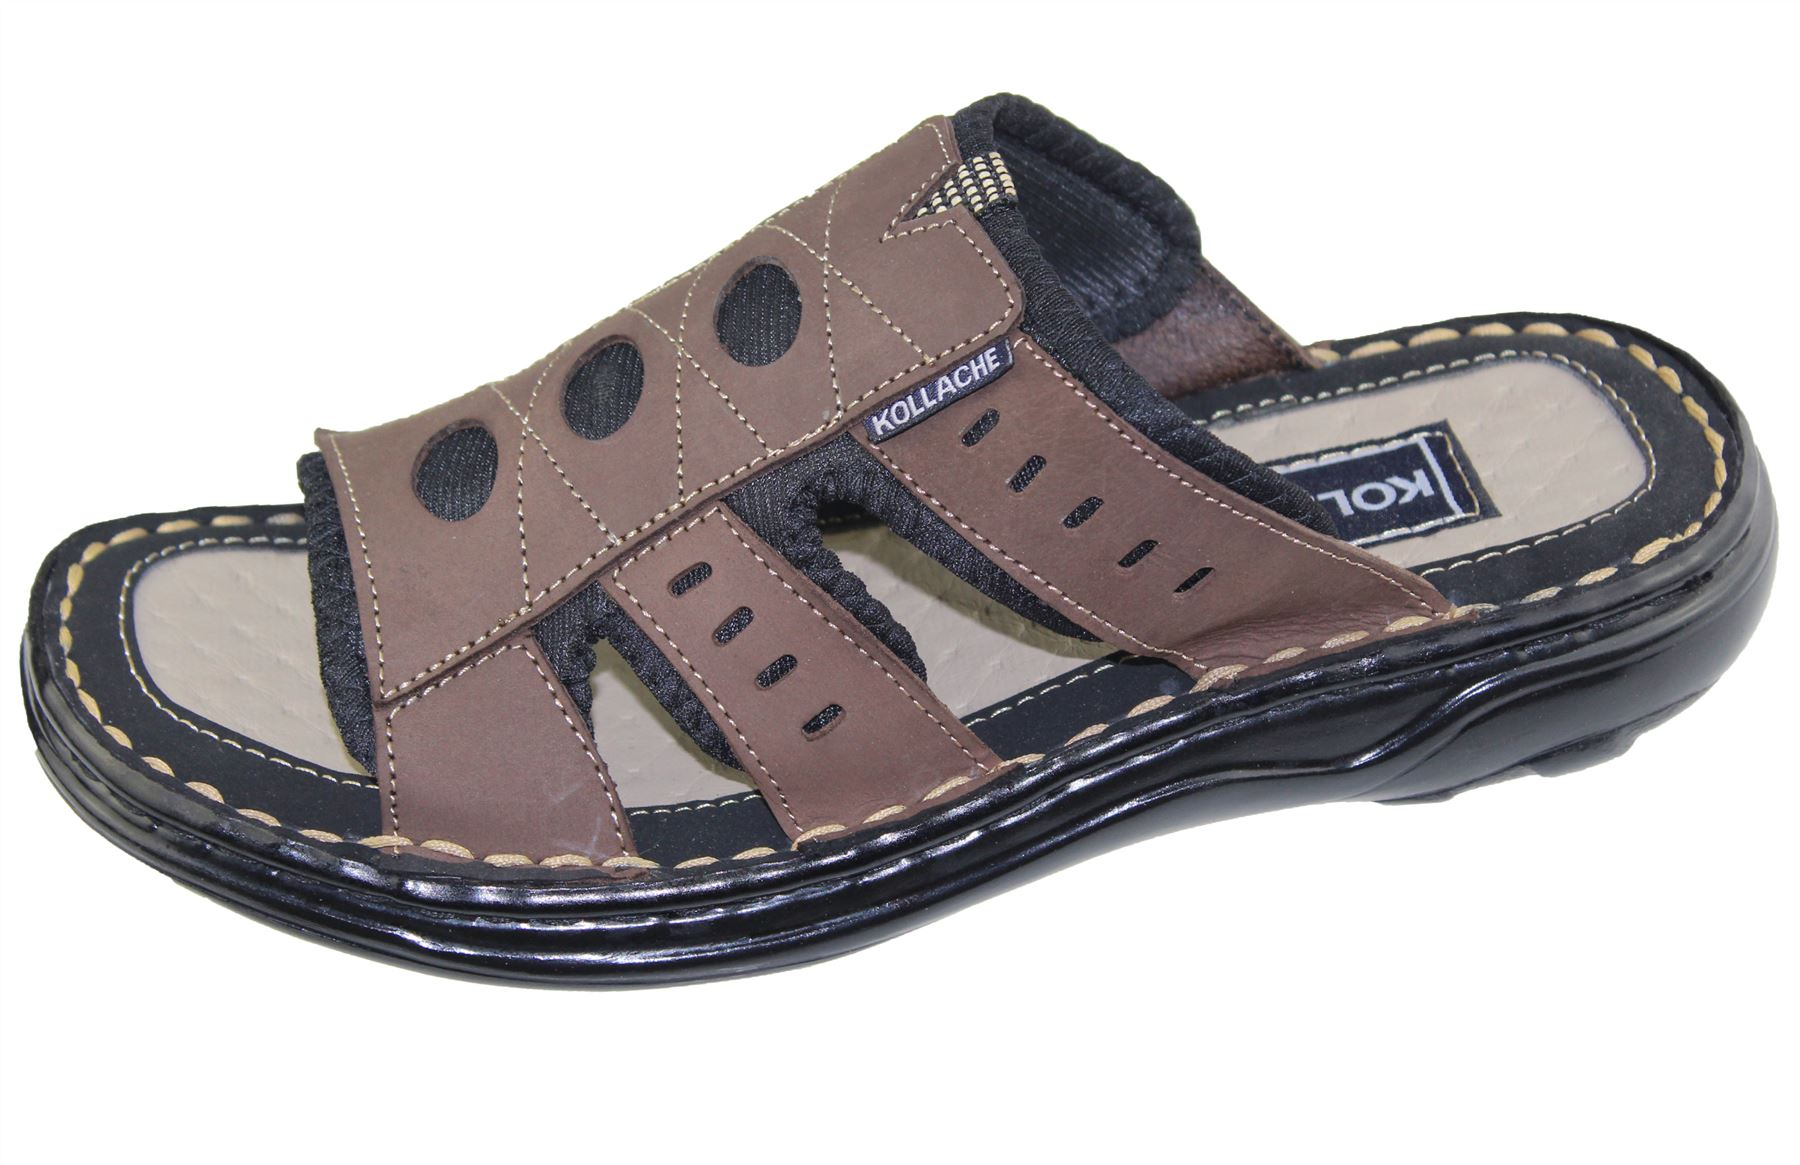 Mens-Slipper-Sandal-Sports-Beach-Buckle-Walking-Fashion-Summer-Casual-Shoes-Size miniatura 24